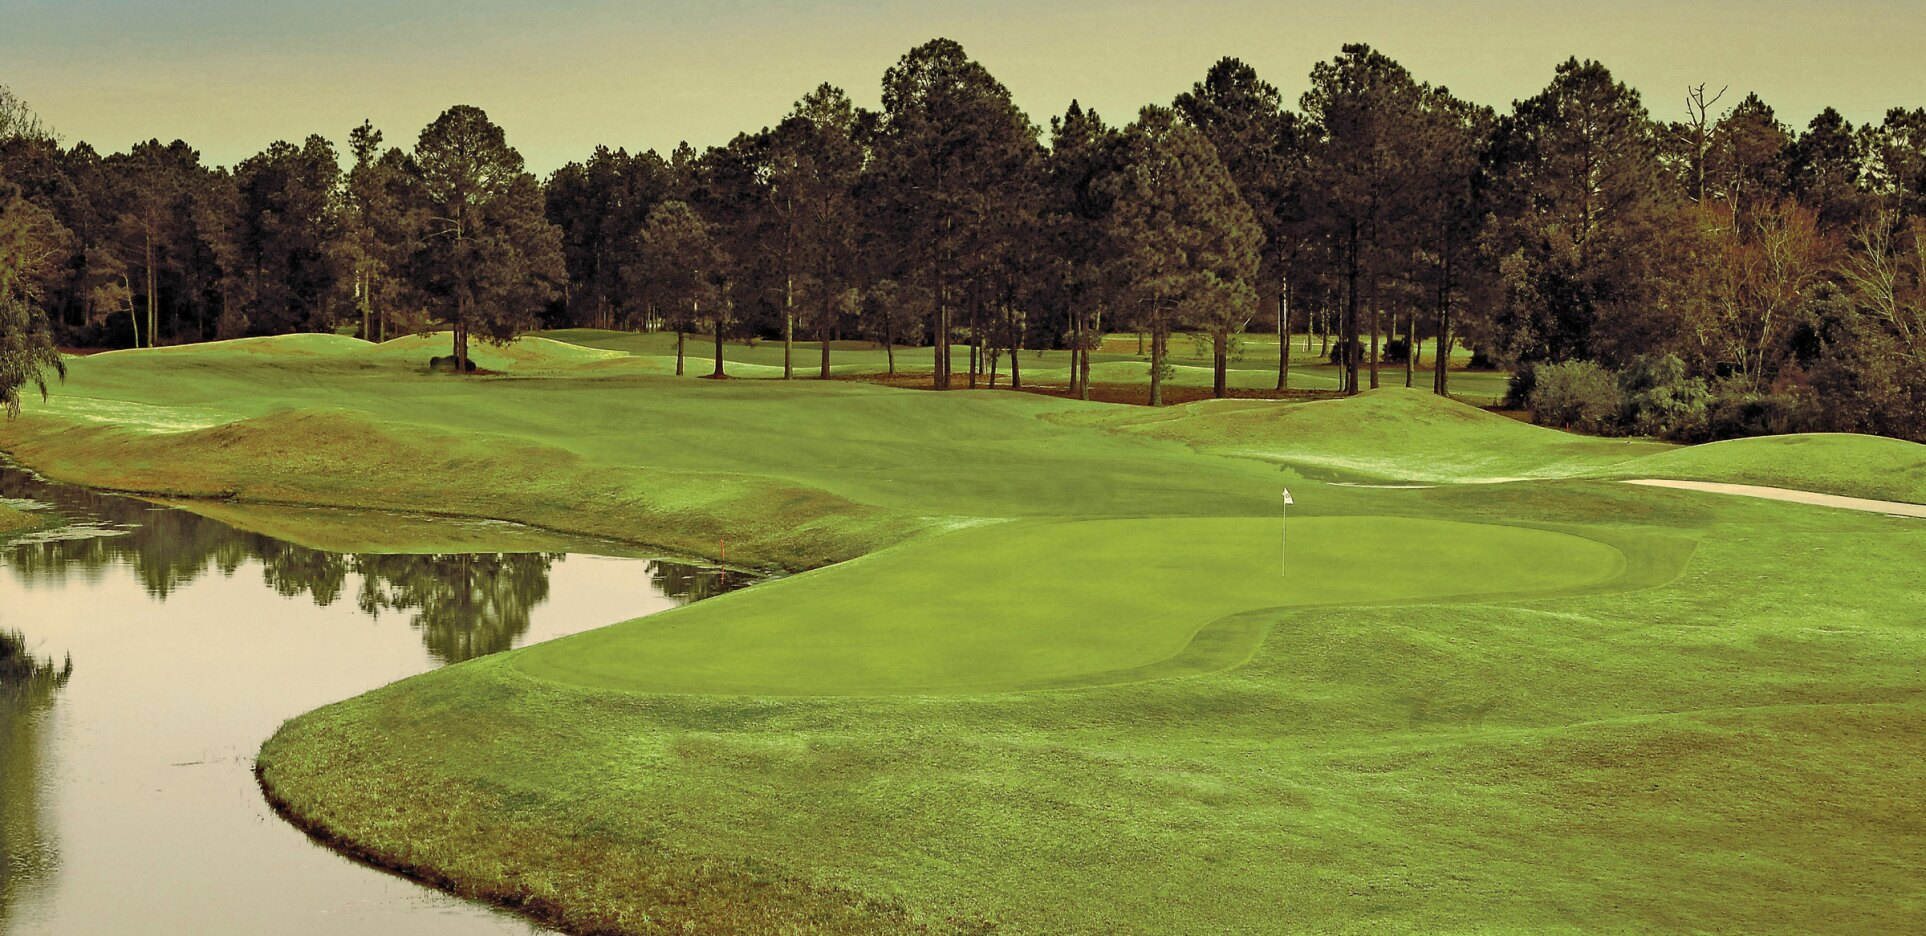 Bent Creek Golf Course, Jacksonville, Florida